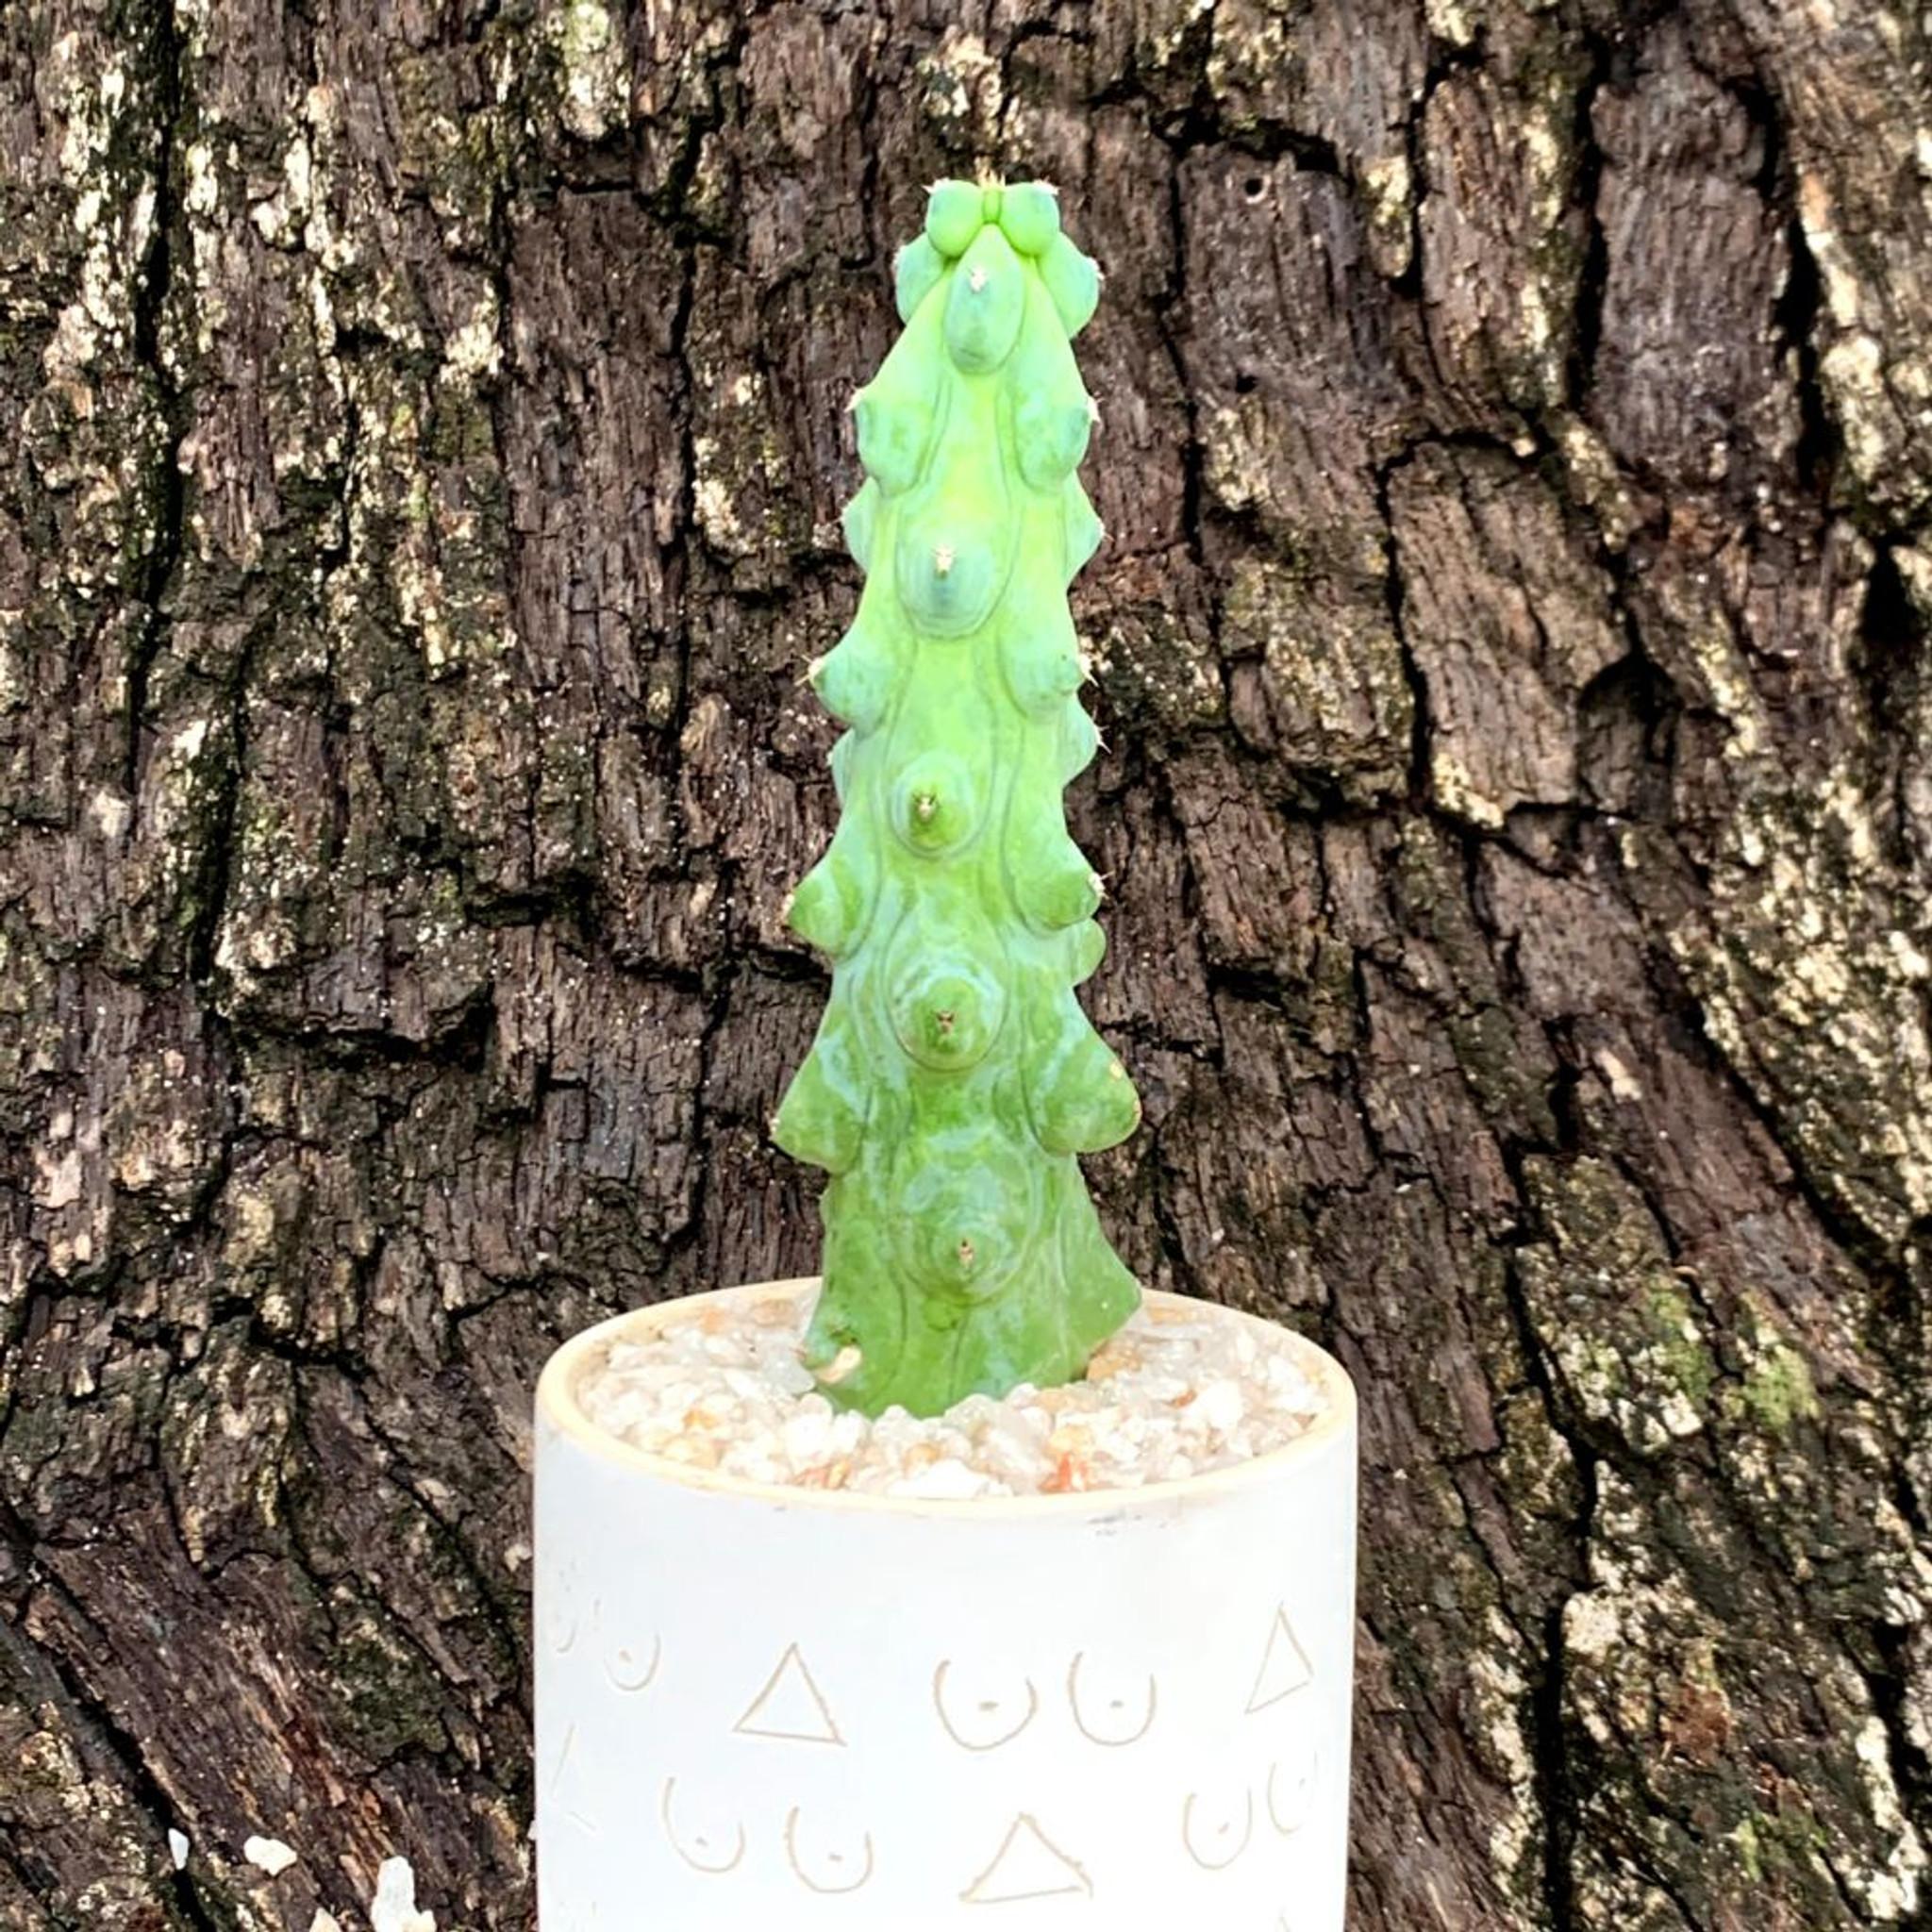 Mini Titty Planter with Medium Titty Cactus